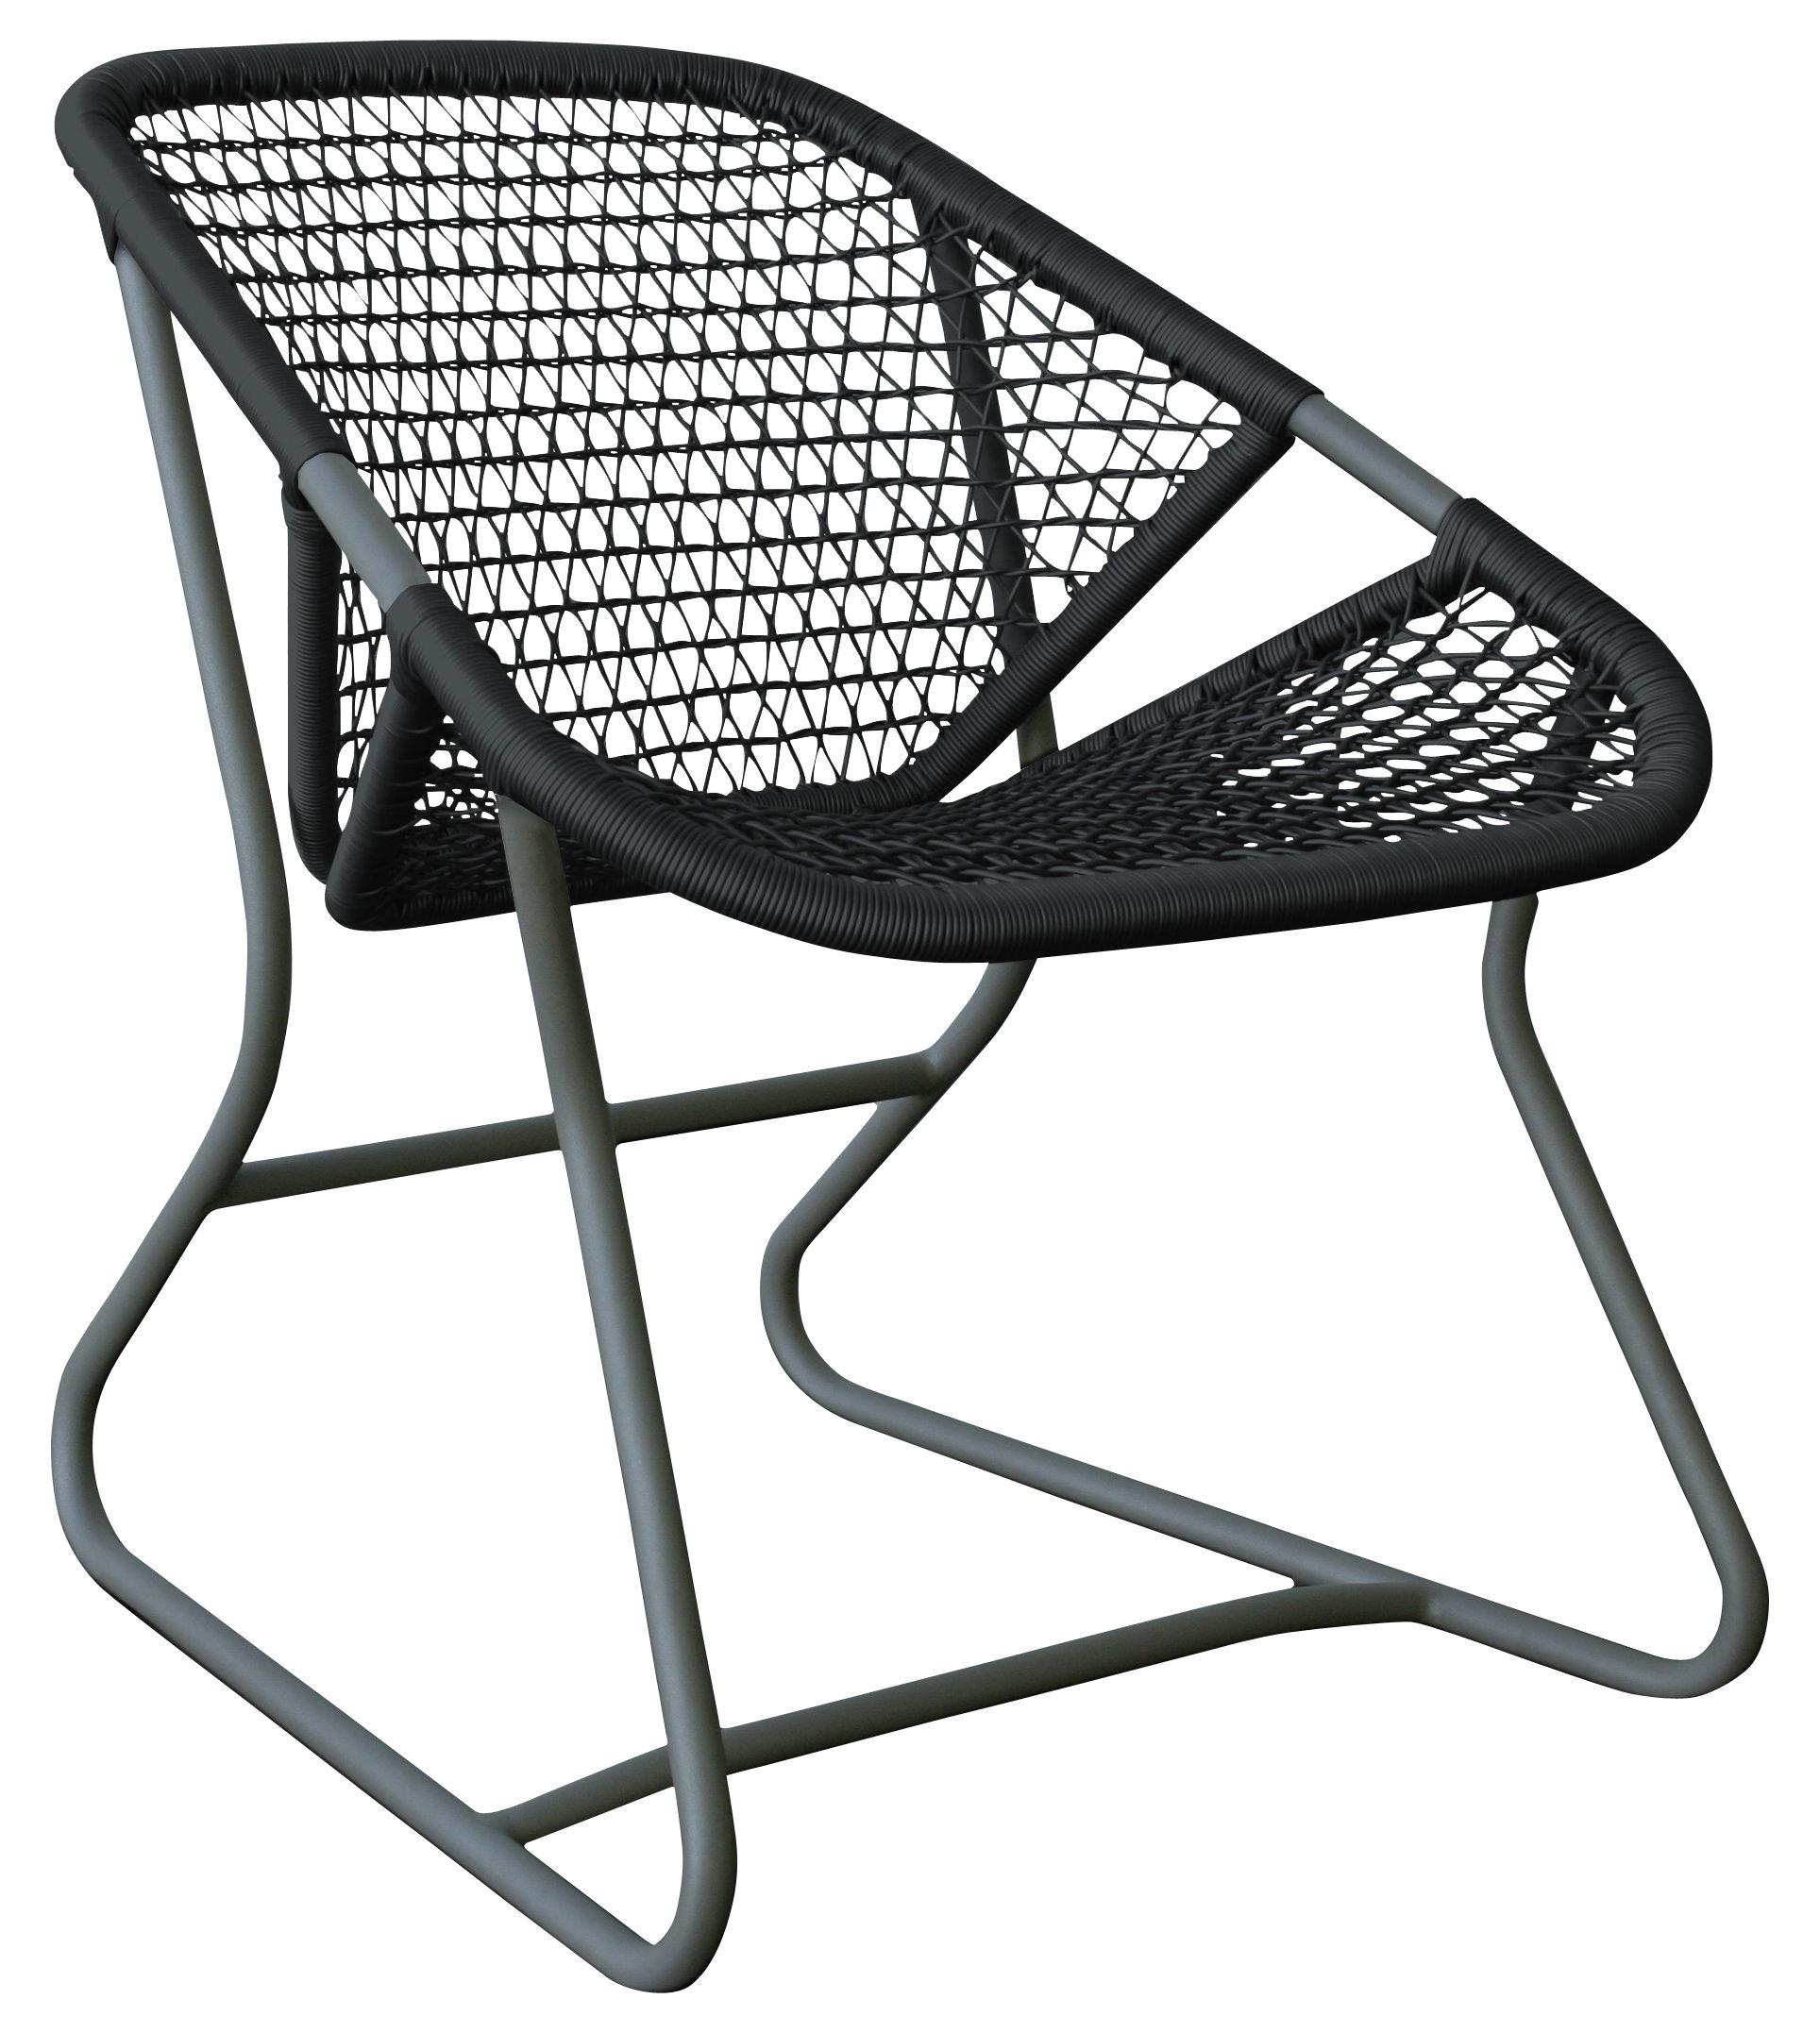 Möbel - Lounge Sessel - Sixties Lounge Sessel - Fermob - Gestell: grau / Sitzfläche: Schiefer - Aluminium, Plastikmaterial